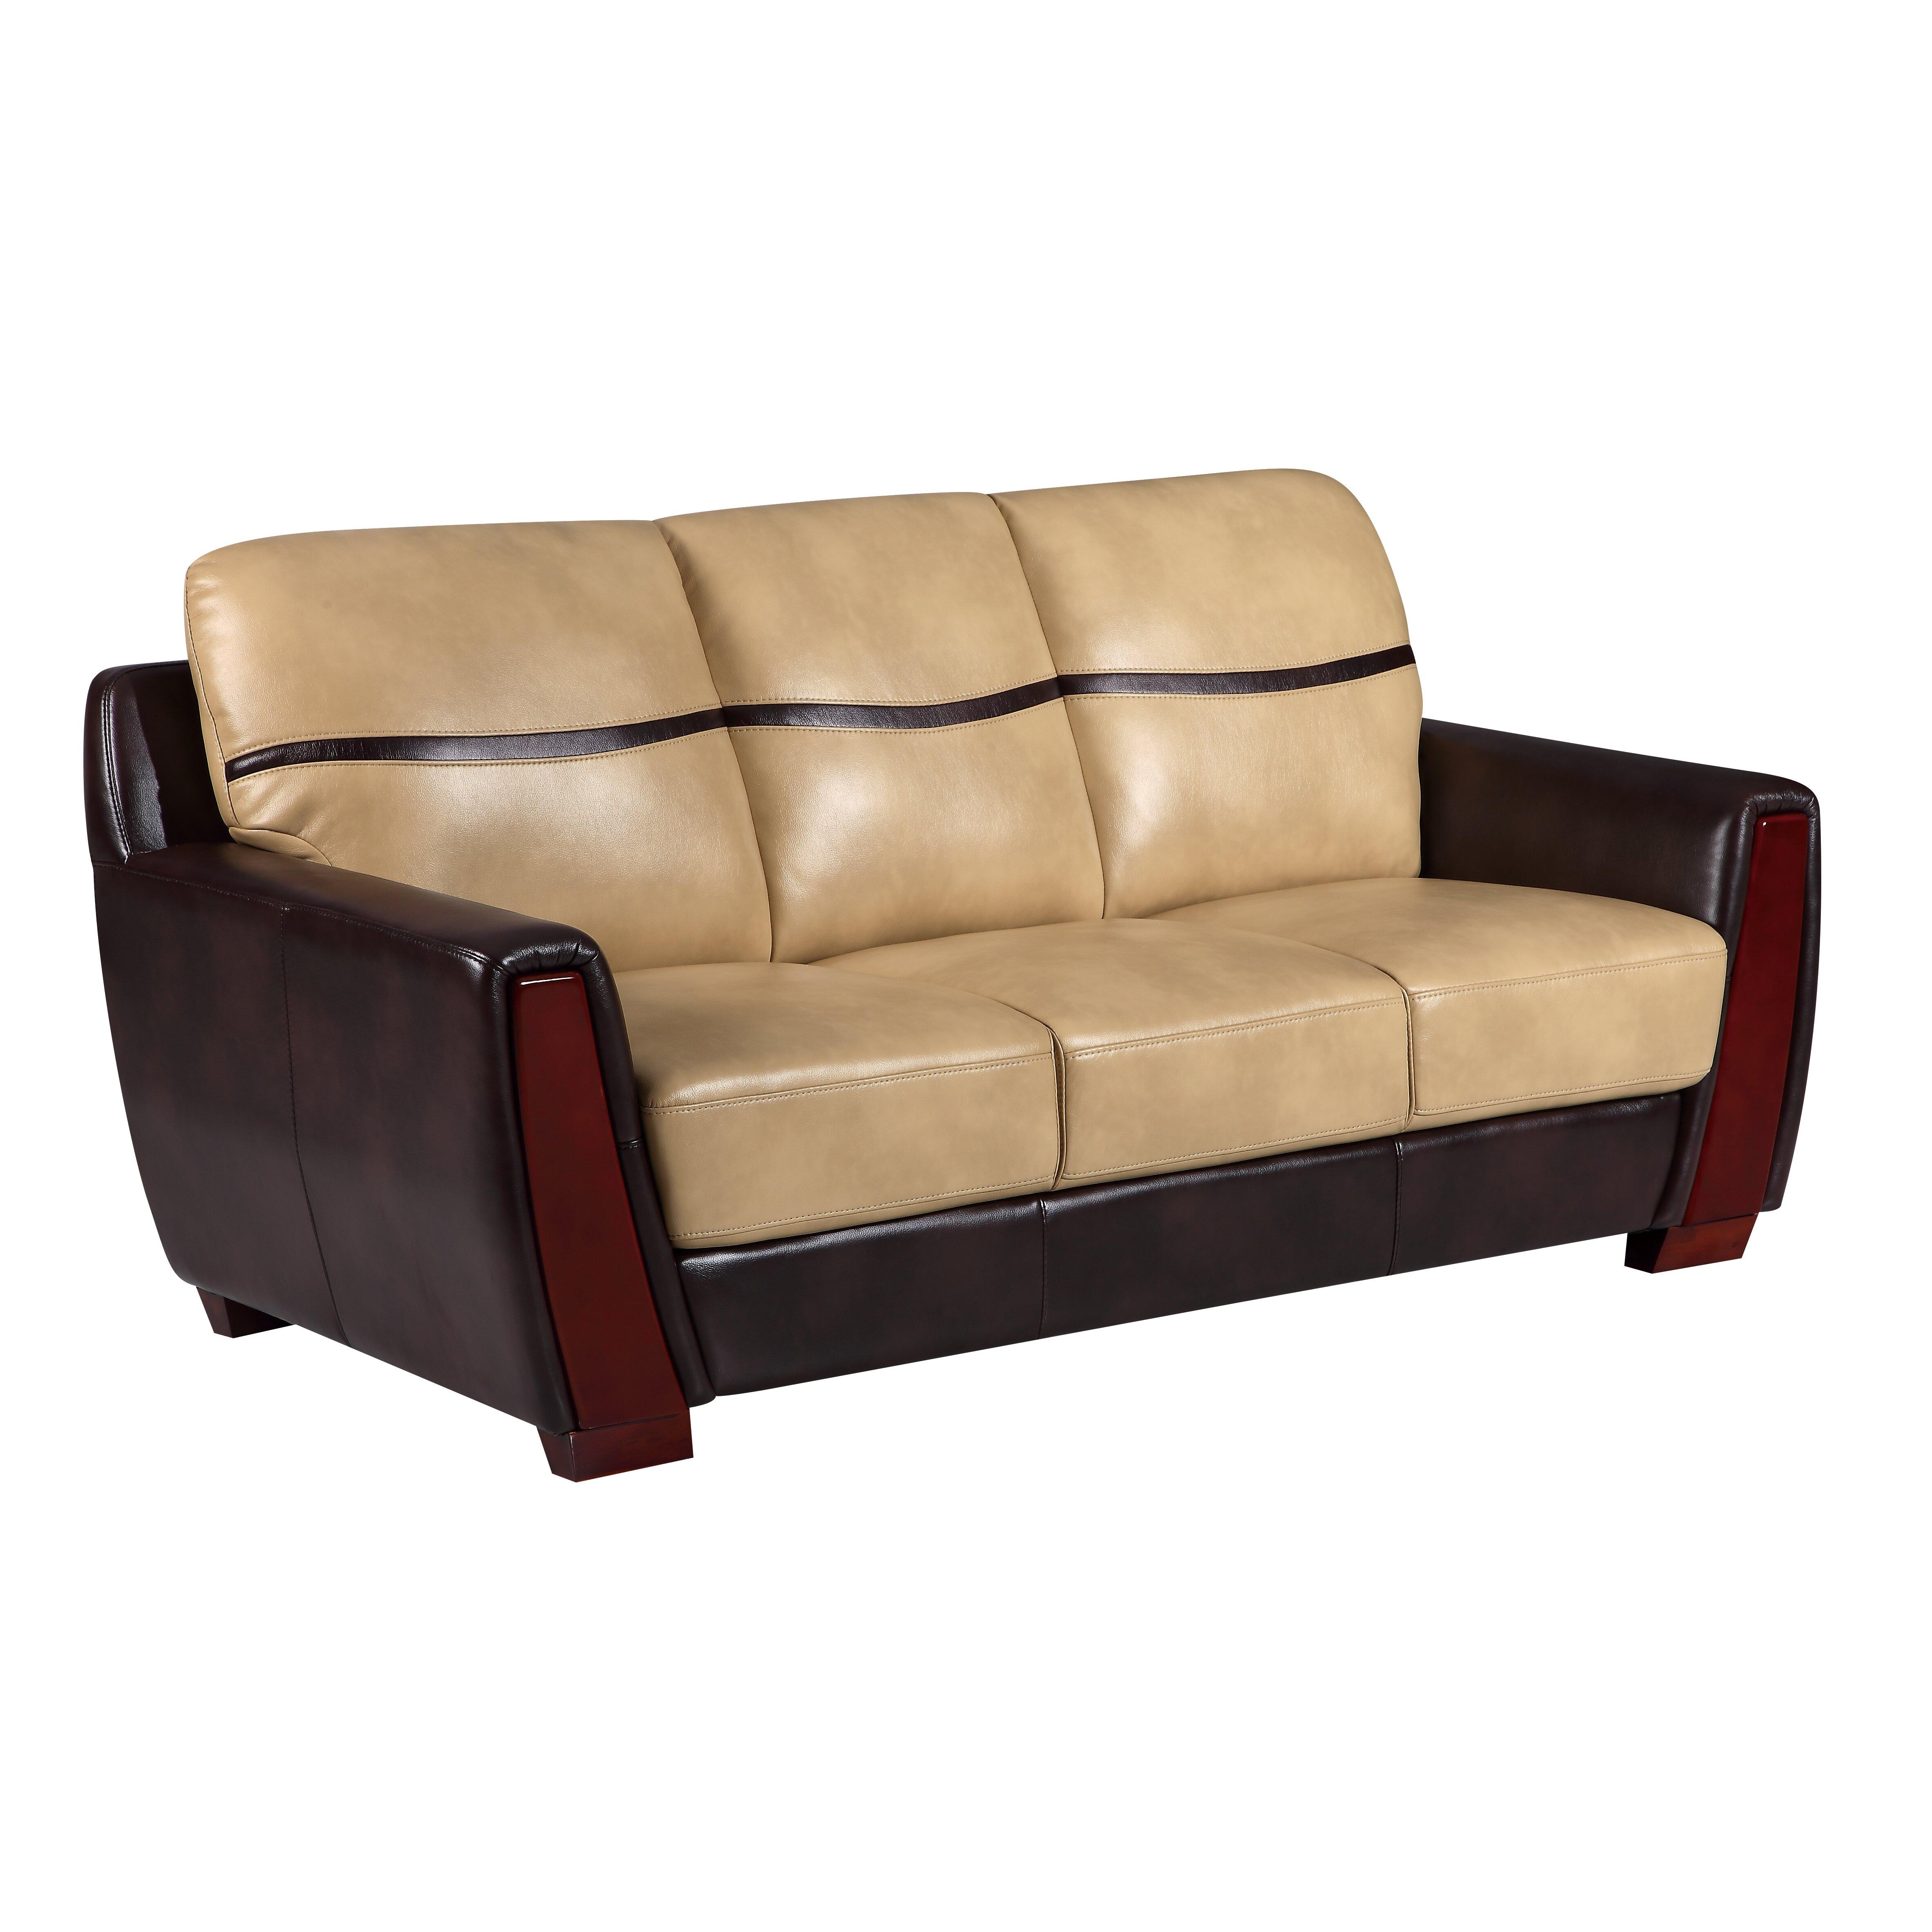 global furniture usa pluto sofa wayfair. Black Bedroom Furniture Sets. Home Design Ideas